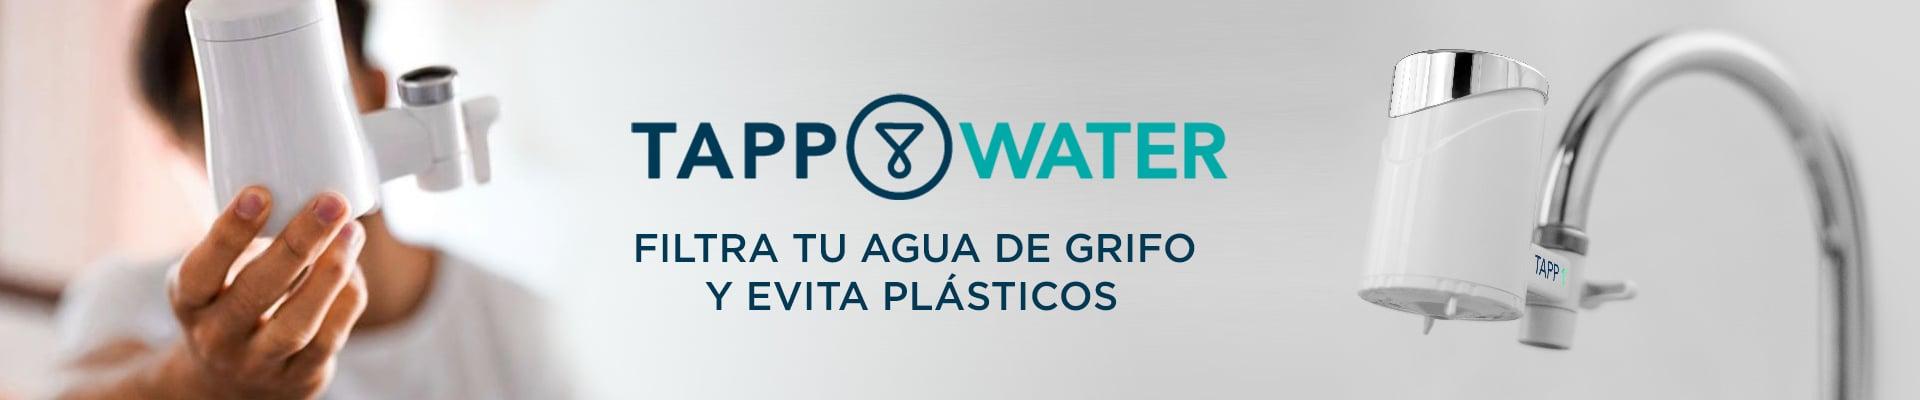 Banner Tapp Water - FKSS 2020